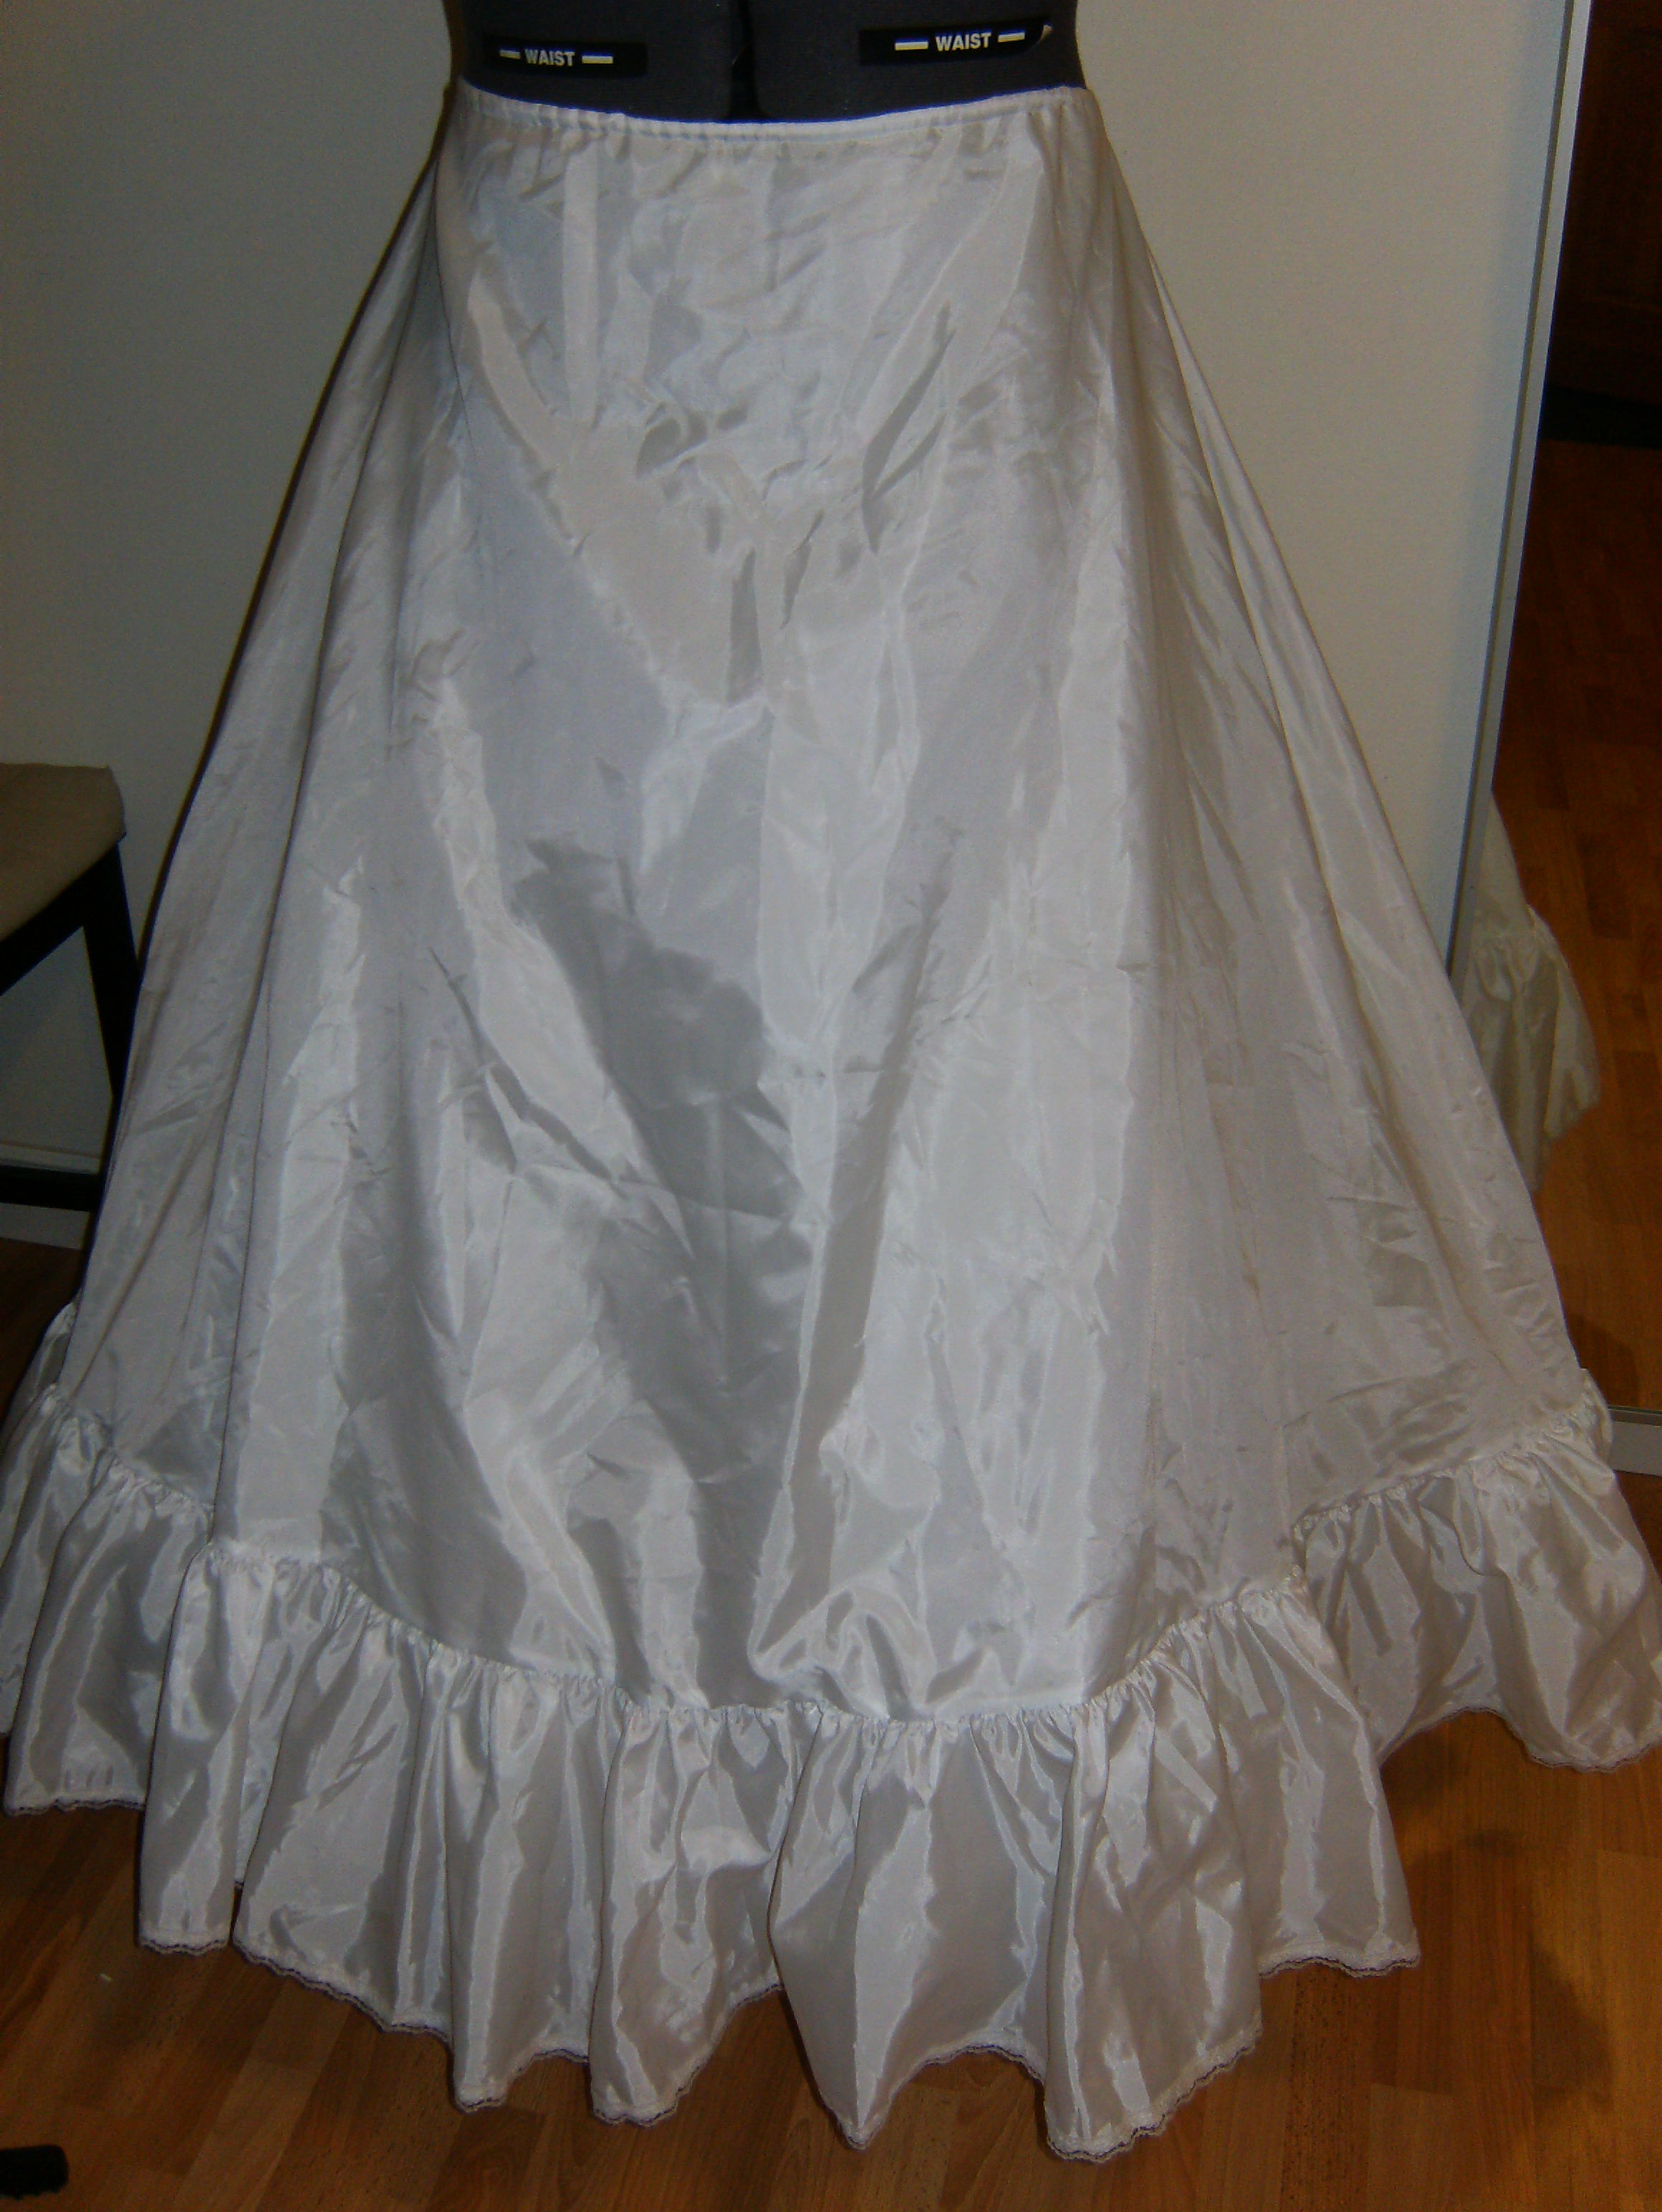 Crinoline drawstring slip wedding dress underslip for Used wedding dresses seattle